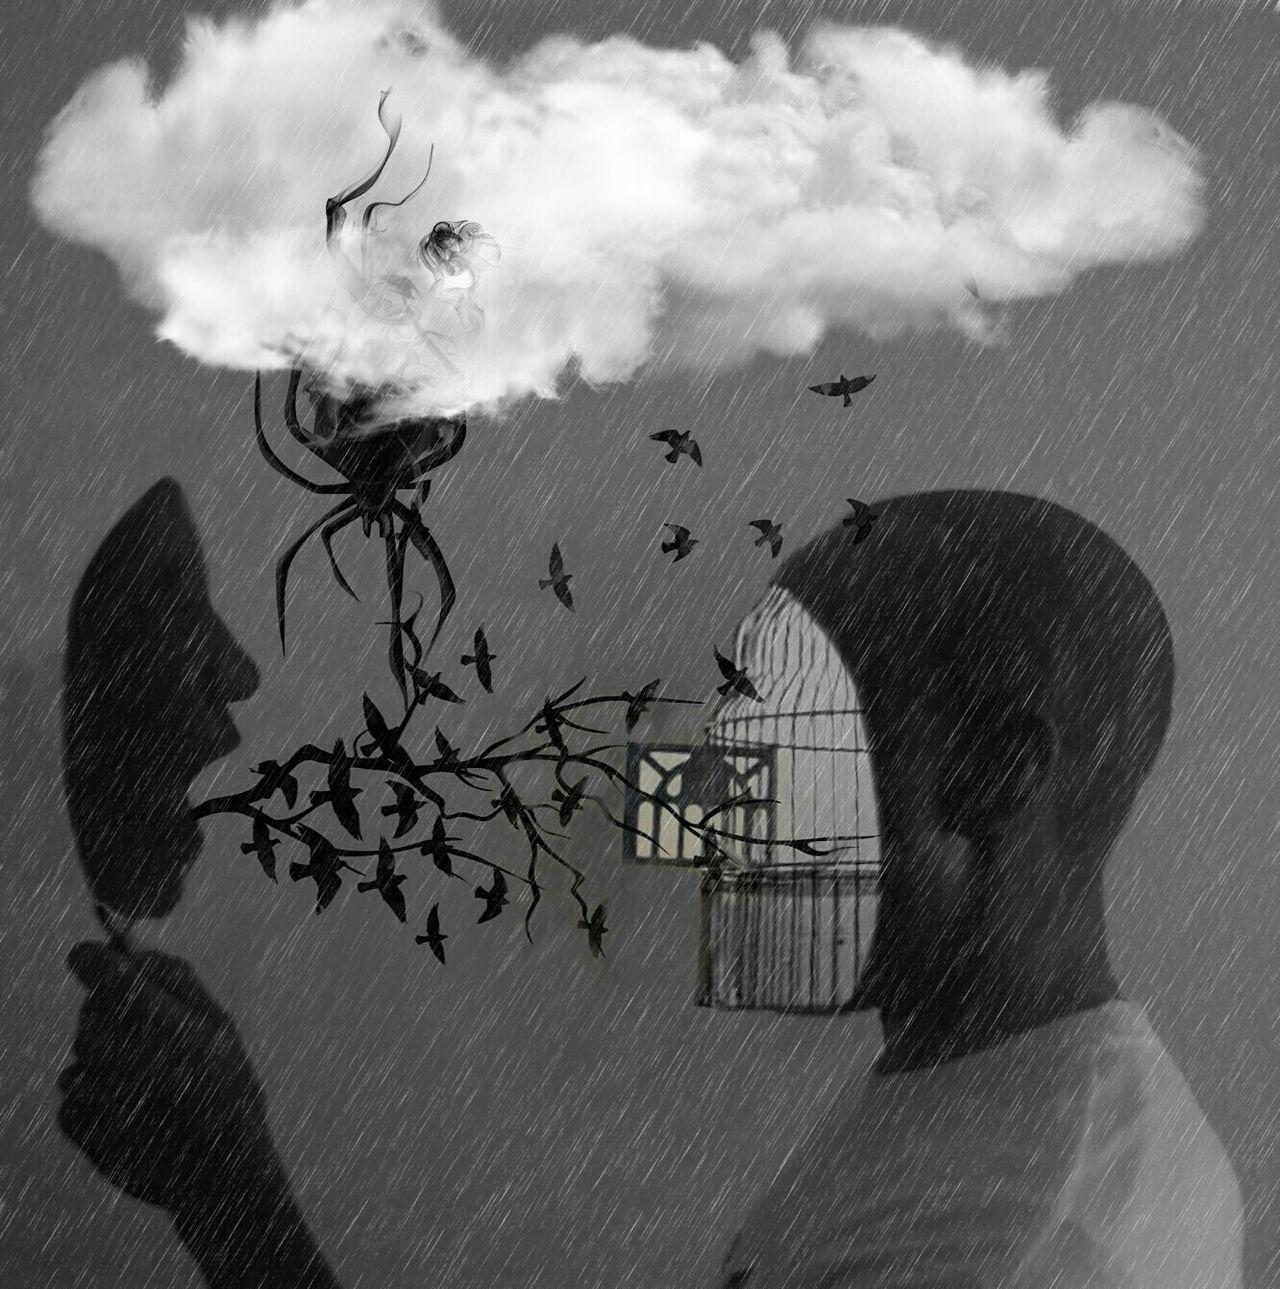 The Tempest #birds #blackandwhite #clouds  #creative Design #creative Power #mirrorshot #spiders #Surréalisme